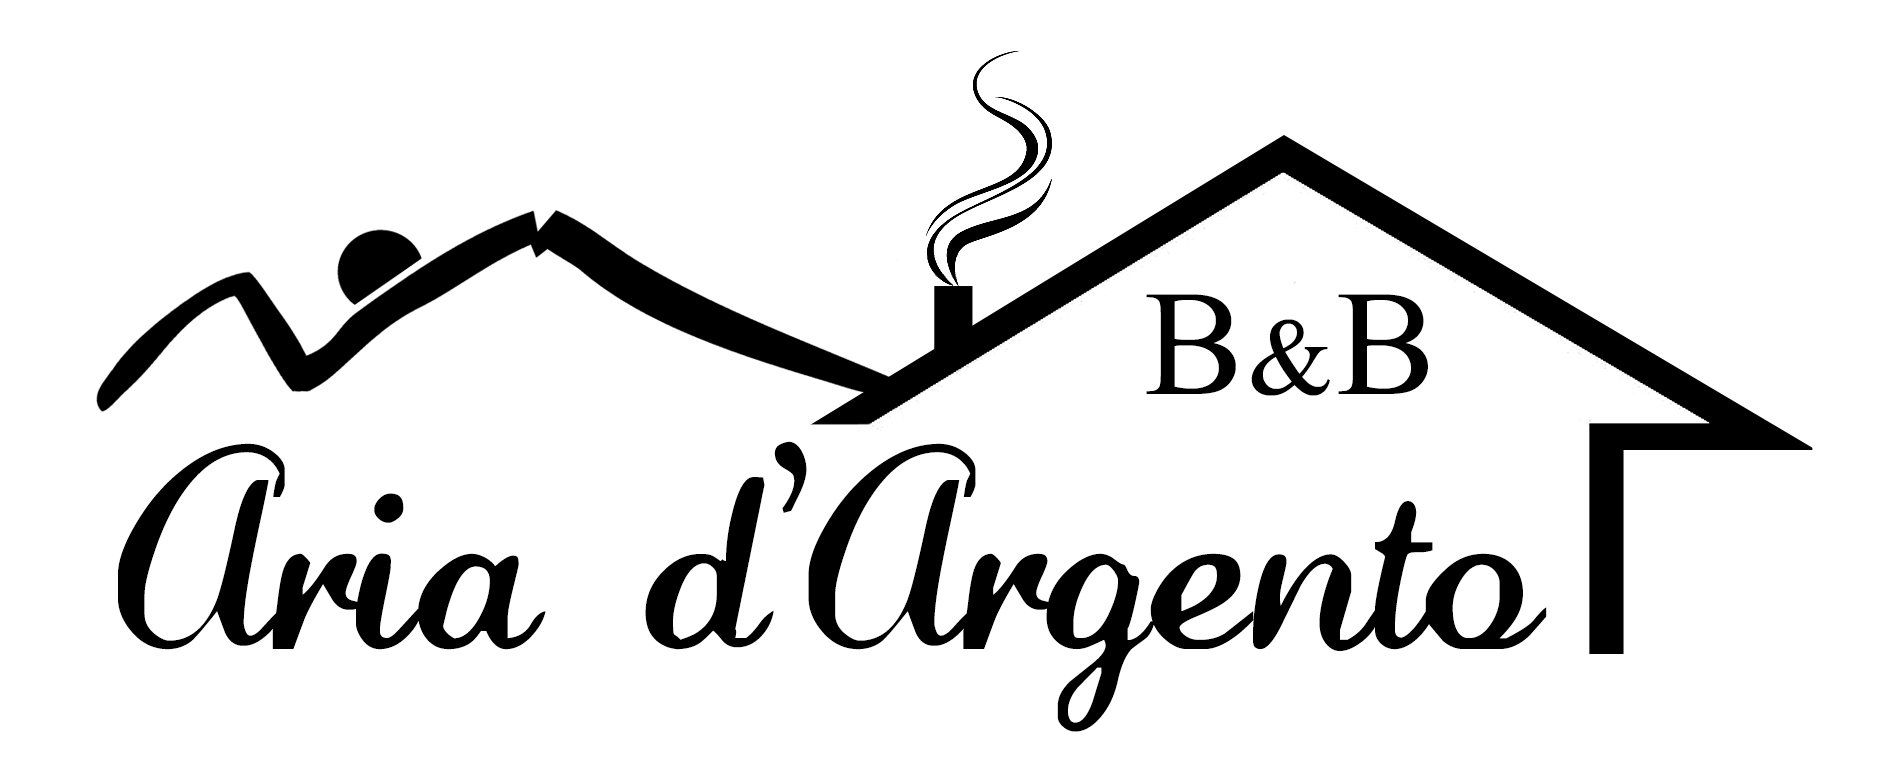 B&B Aria d'Argento